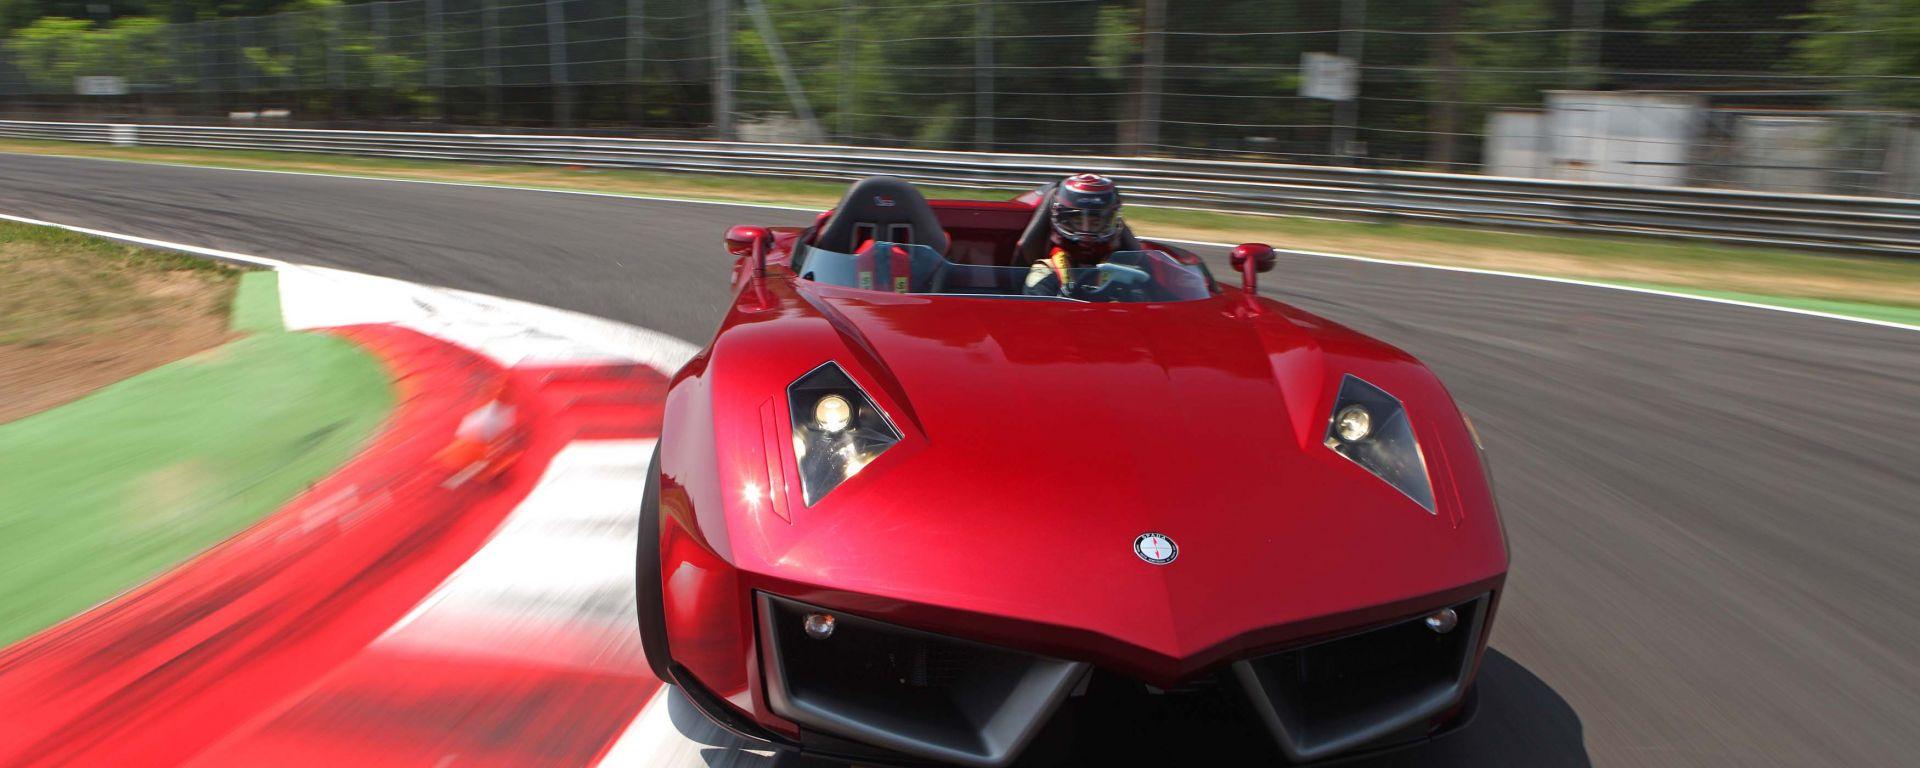 Spada Codatronca Monza: 55 nuove foto in HD